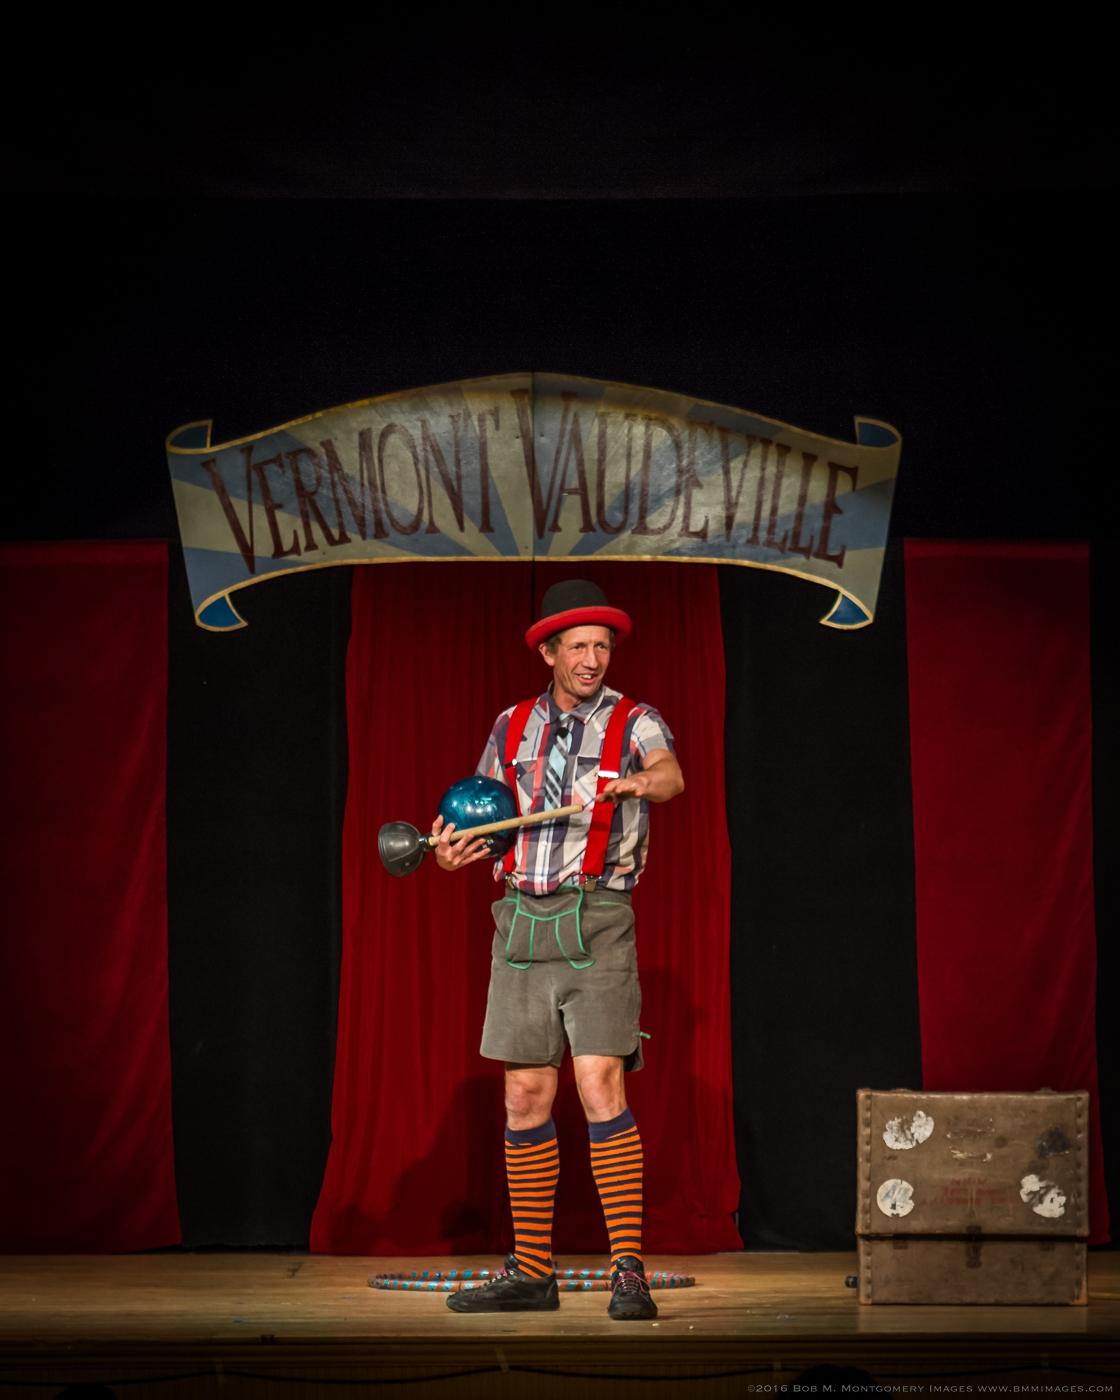 Vermont Vaudeville 20160513 - 0044.jpg